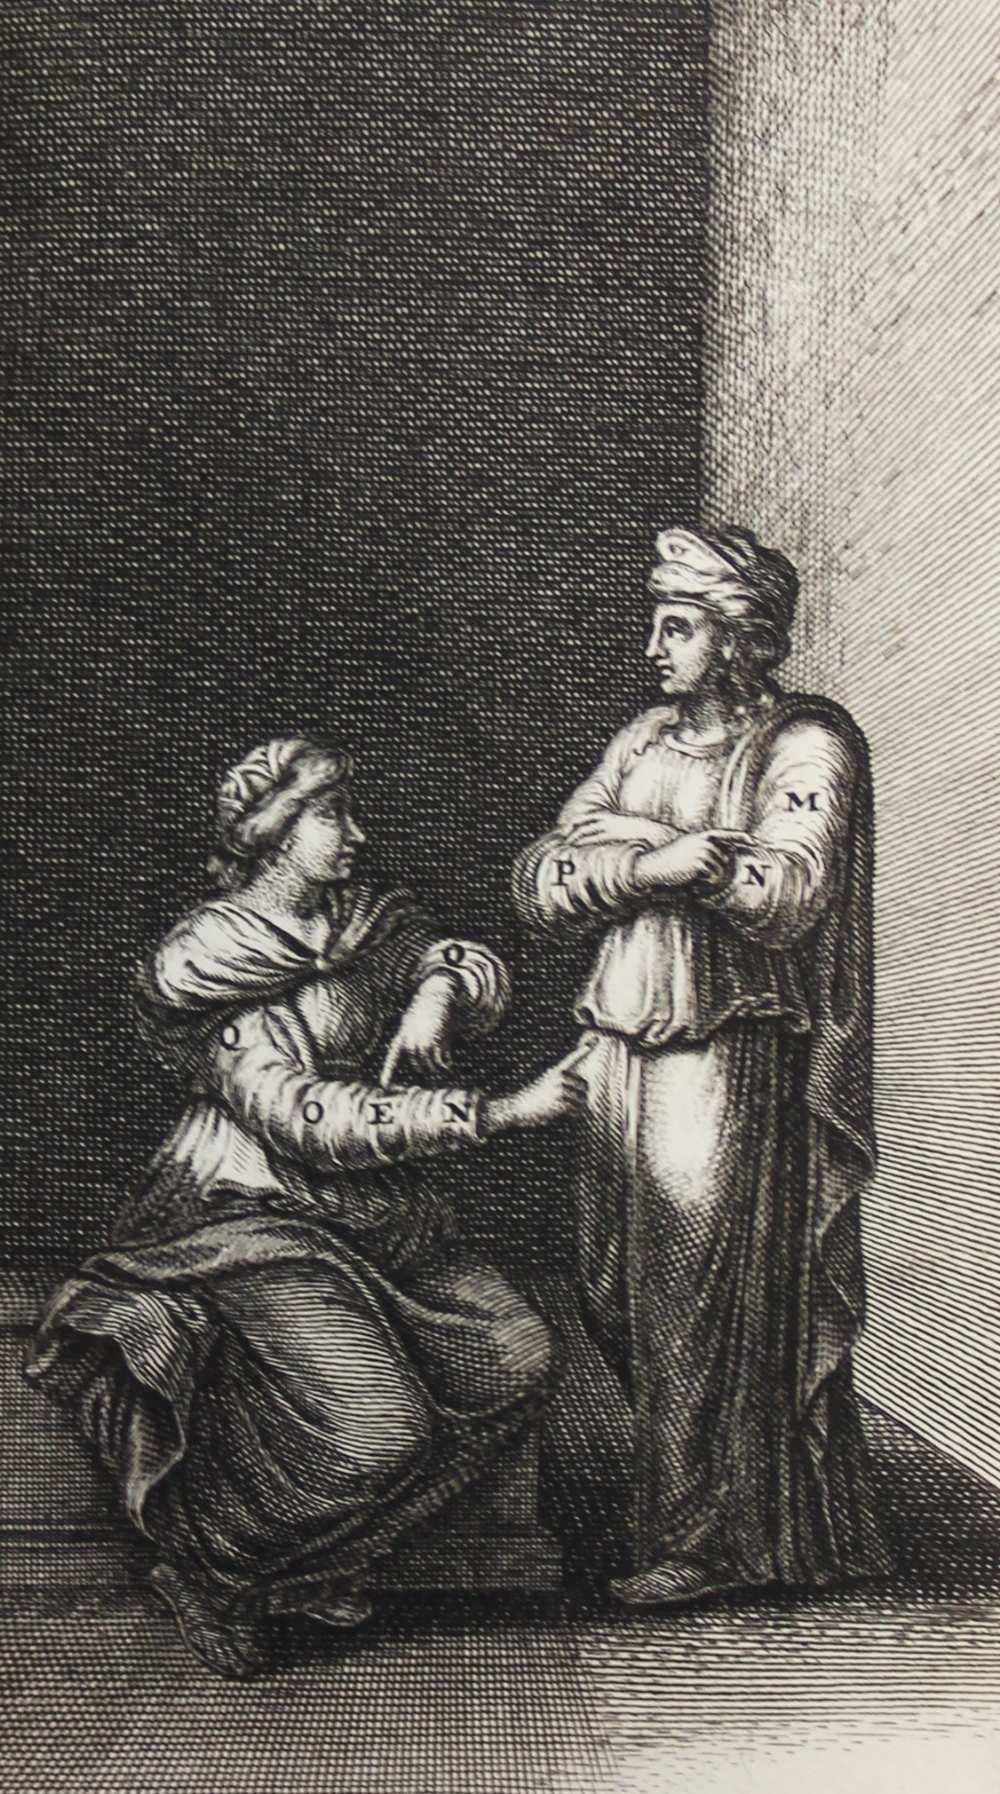 Da Vinci (L), A TREATISE OF PAINTING BY LEONARDO DA VINCI. TRANSLATED FROM THE ORIGINAL ITALIAN, AND - Image 7 of 9